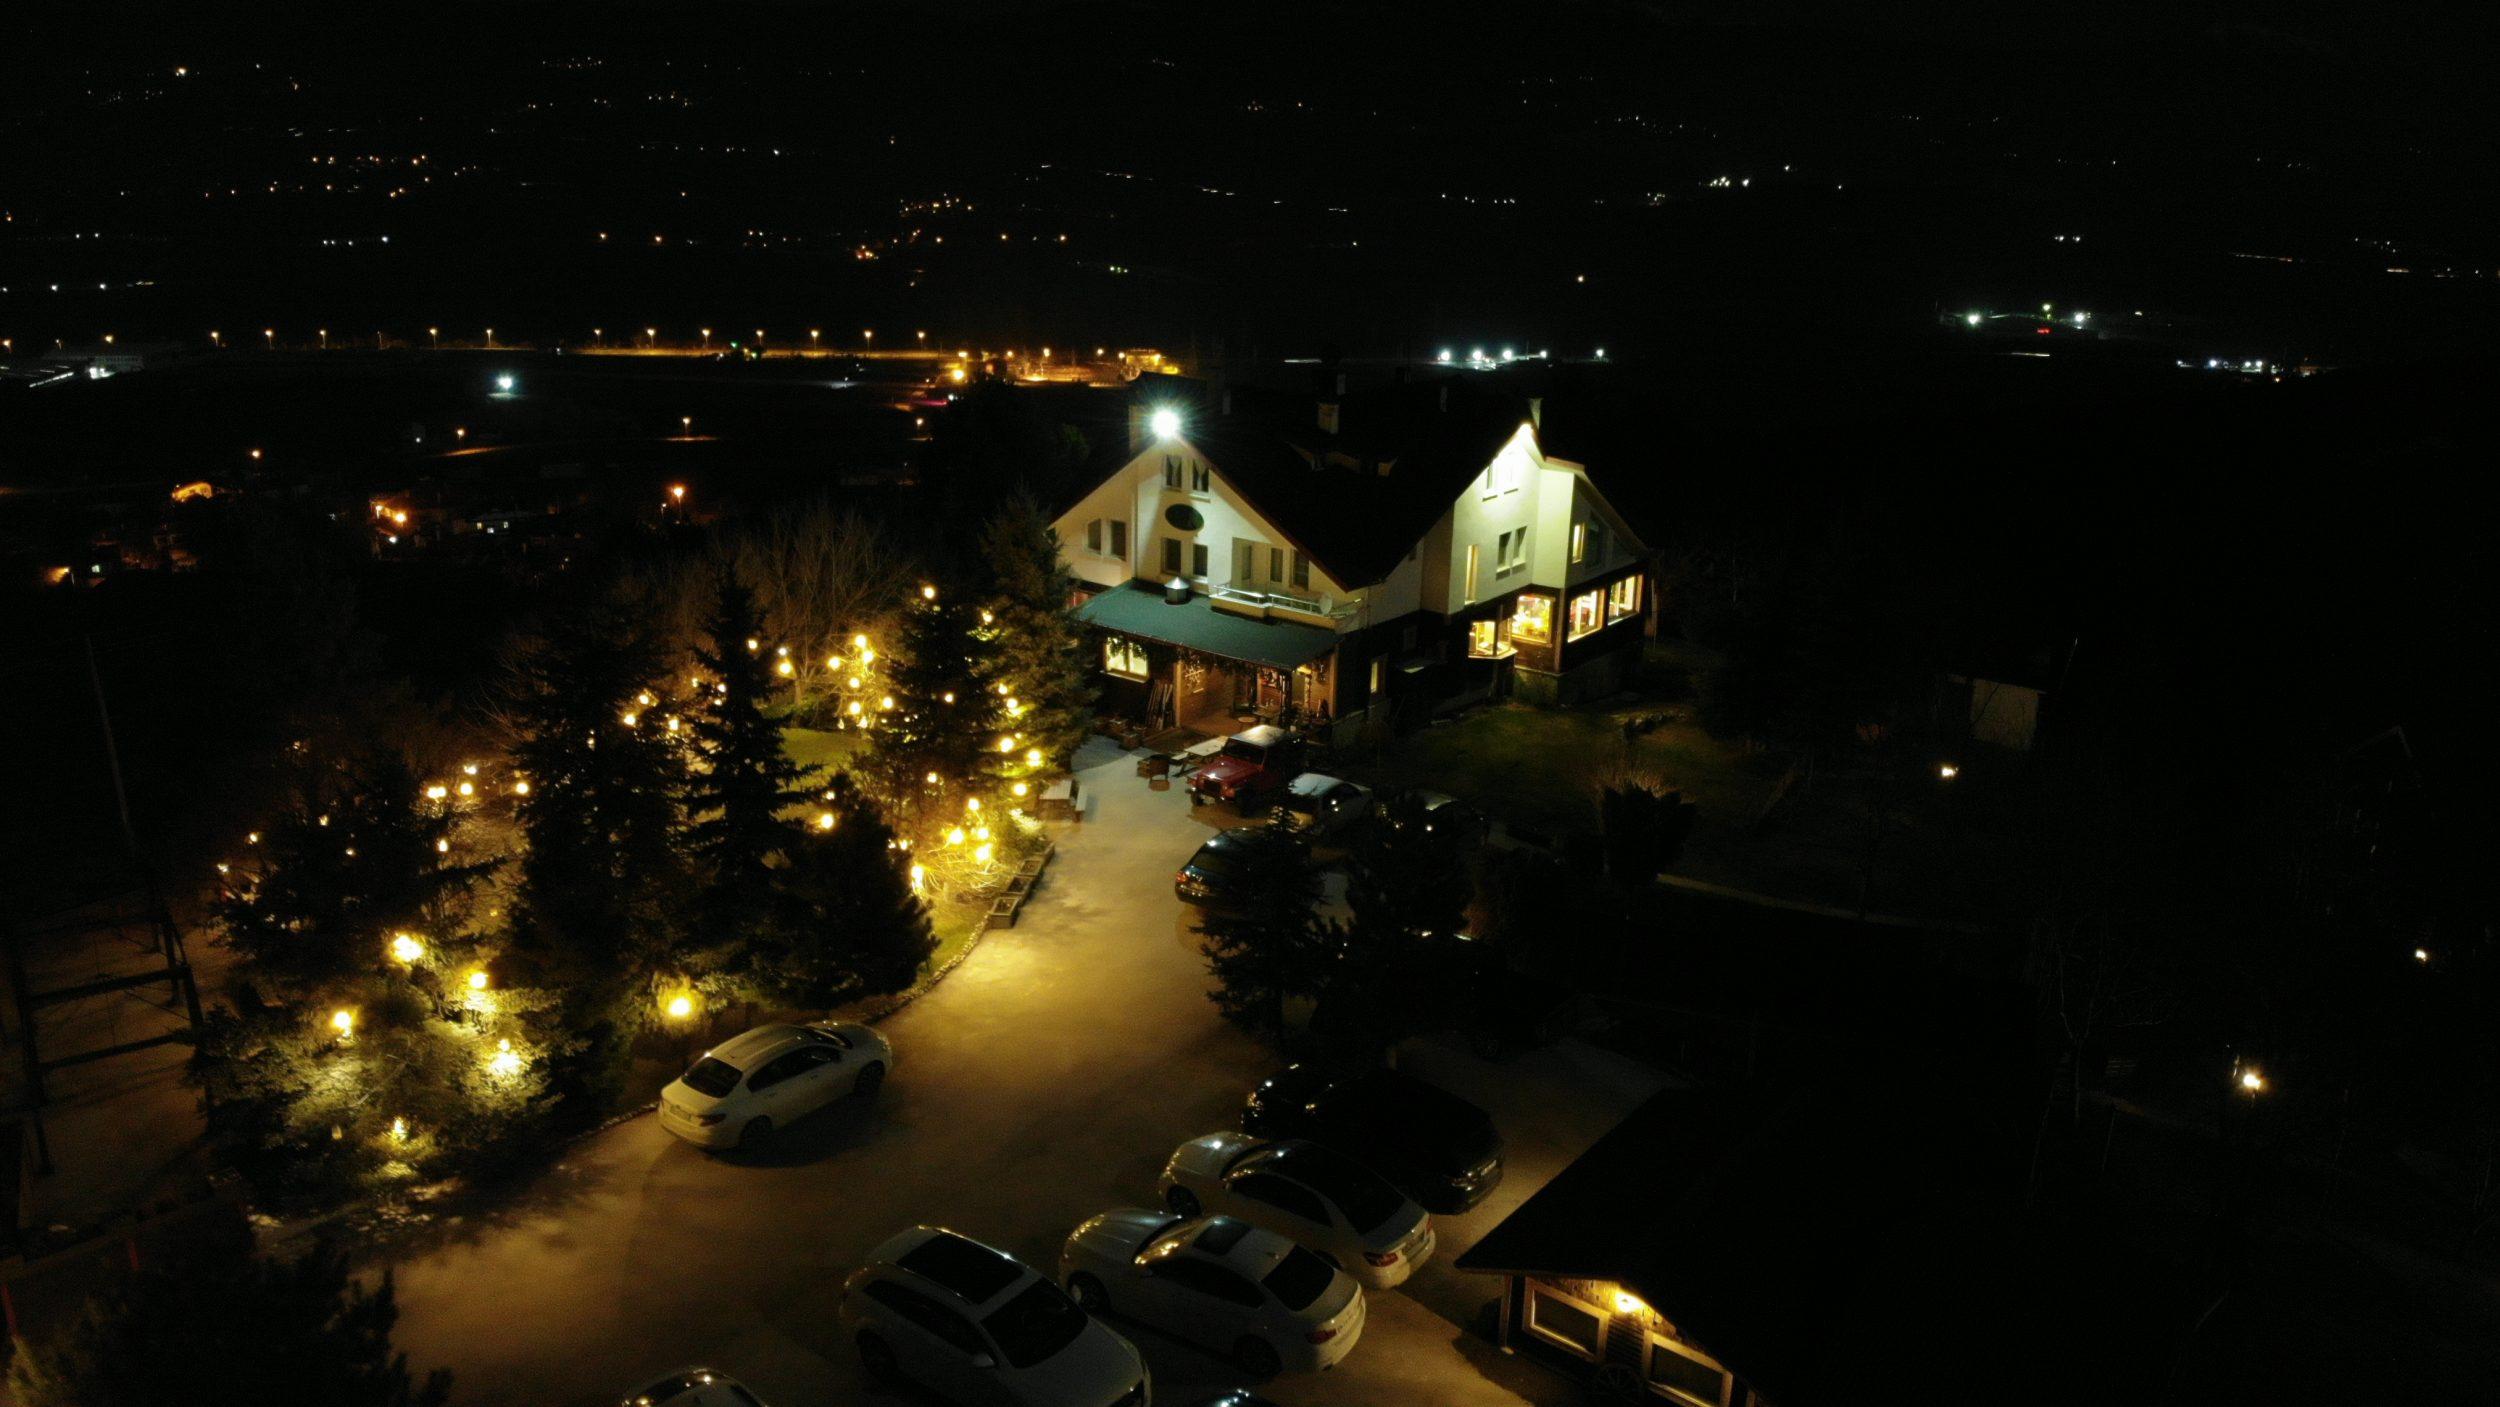 Bolu Kartaltepe Boutique Hotel